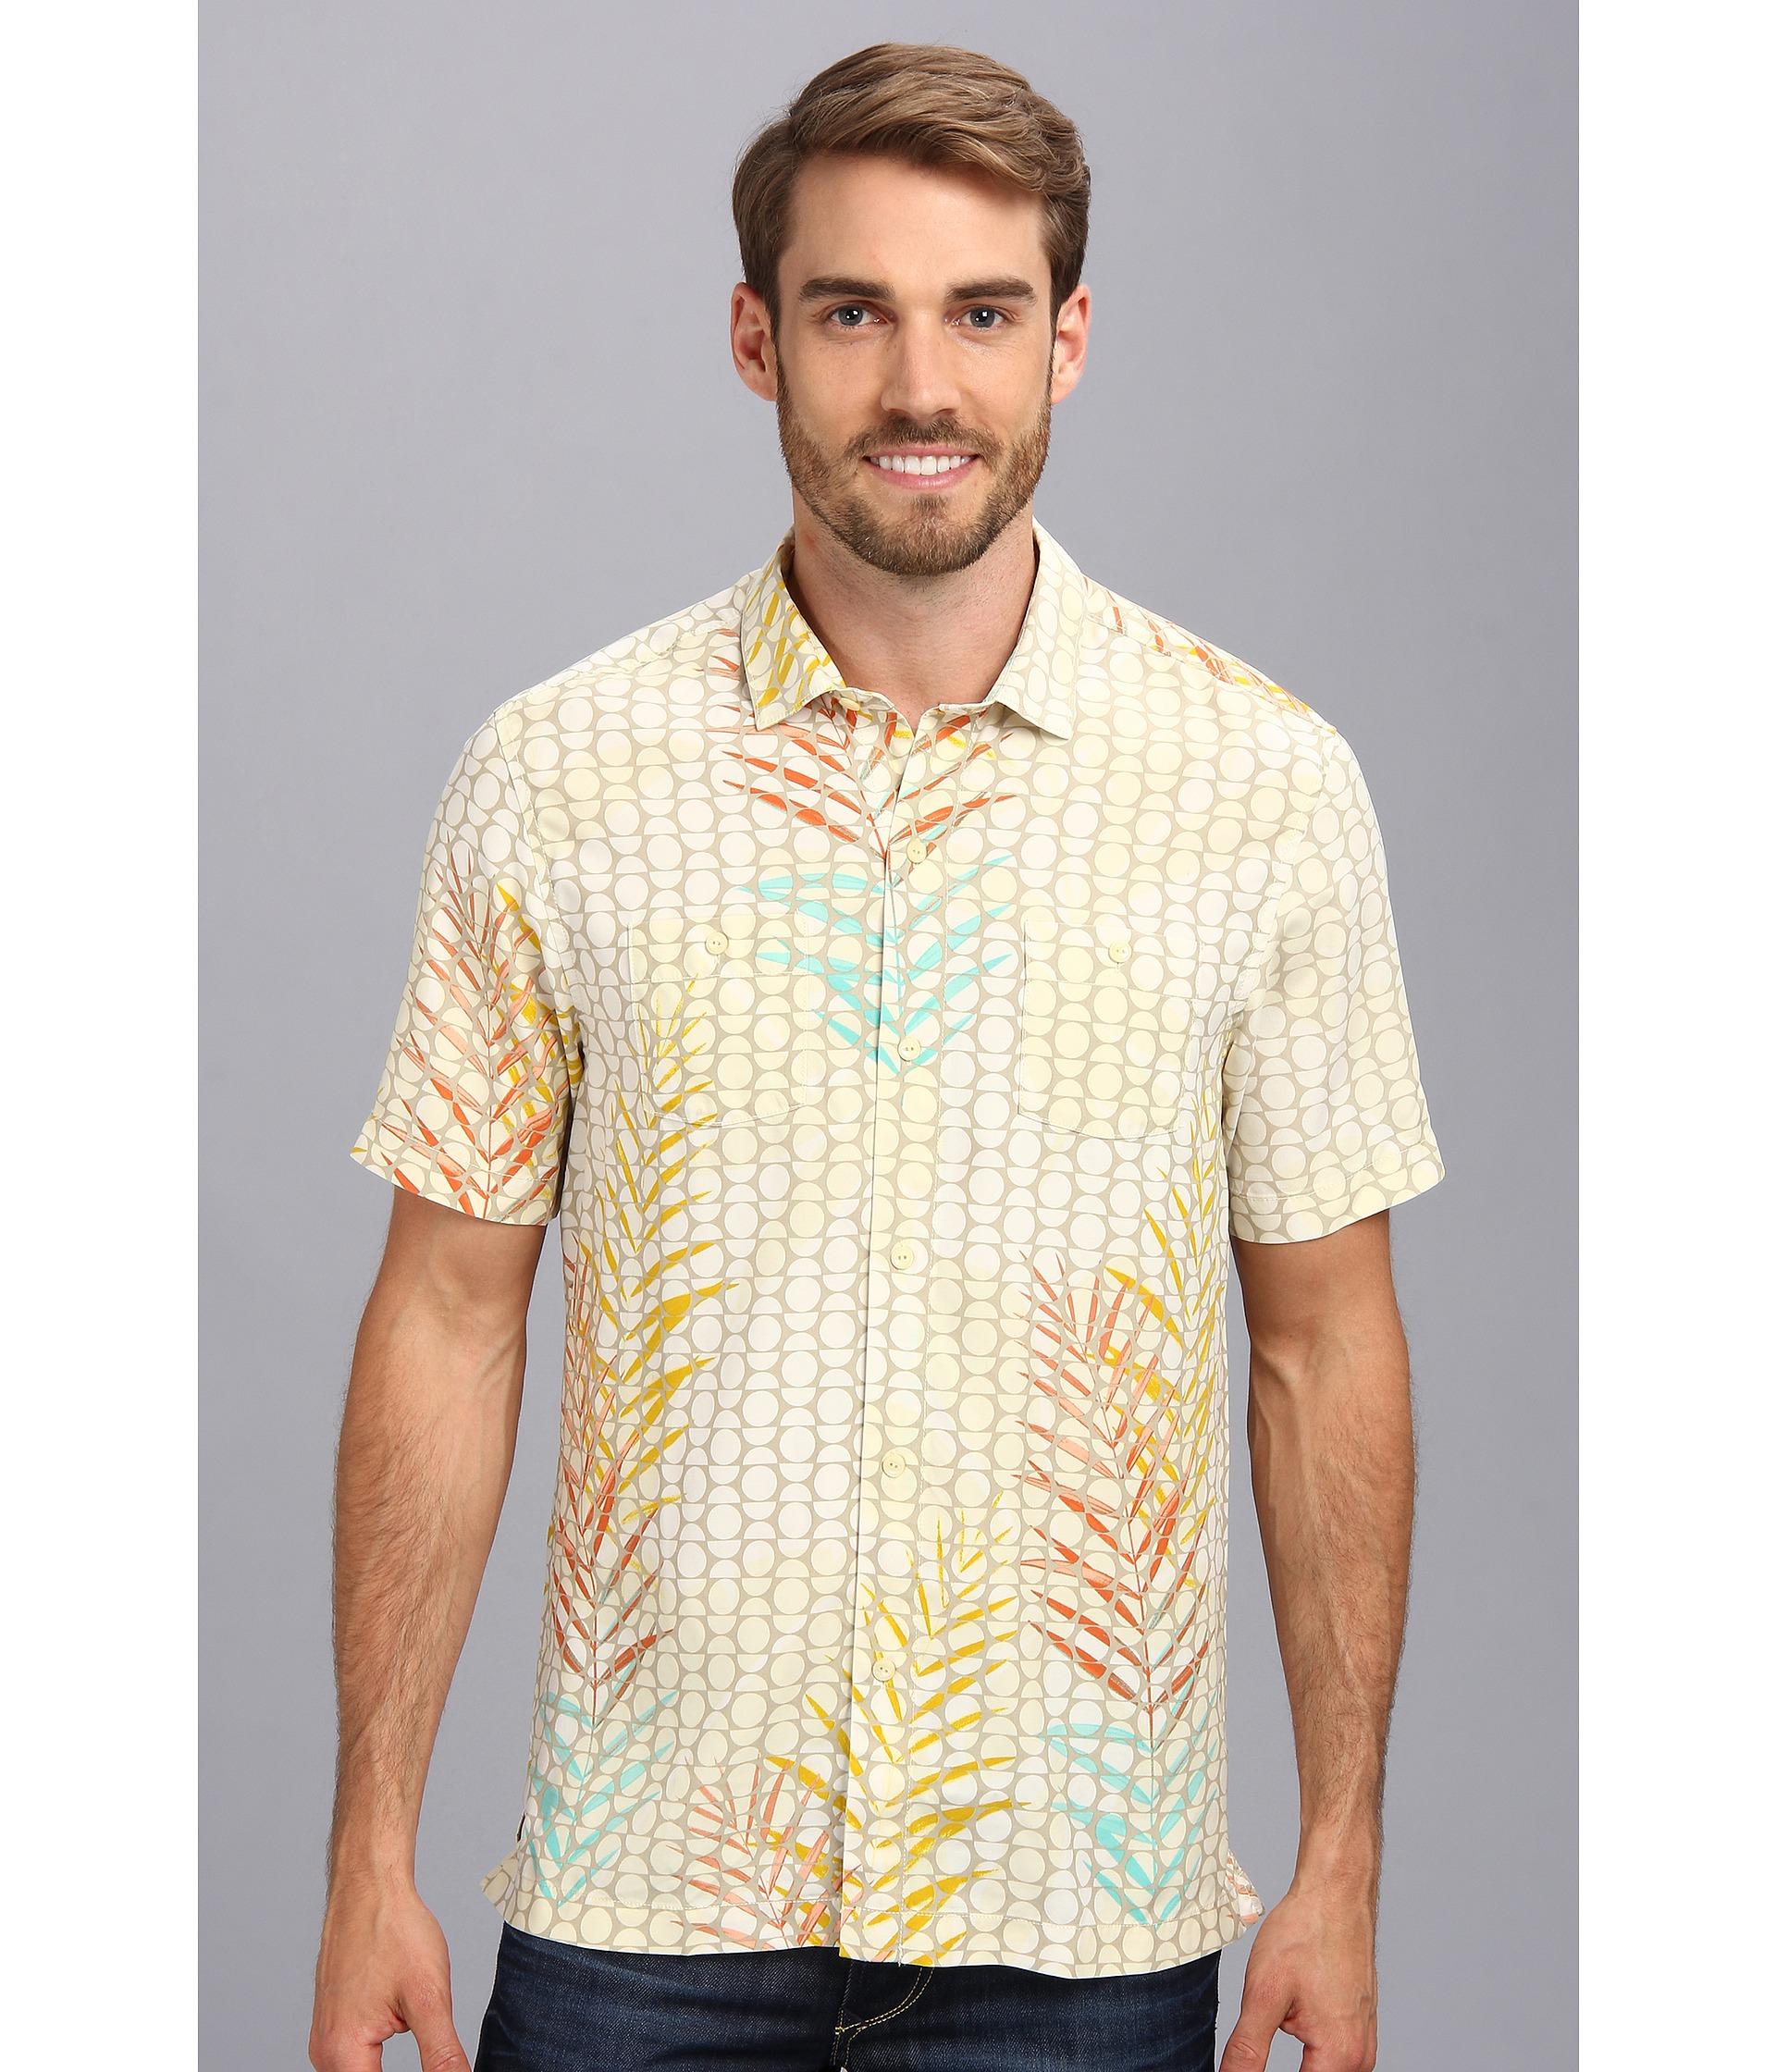 Tommy bahama island modern fit plinko palms ss camp shirt for Tommy bahama christmas shirt 2014